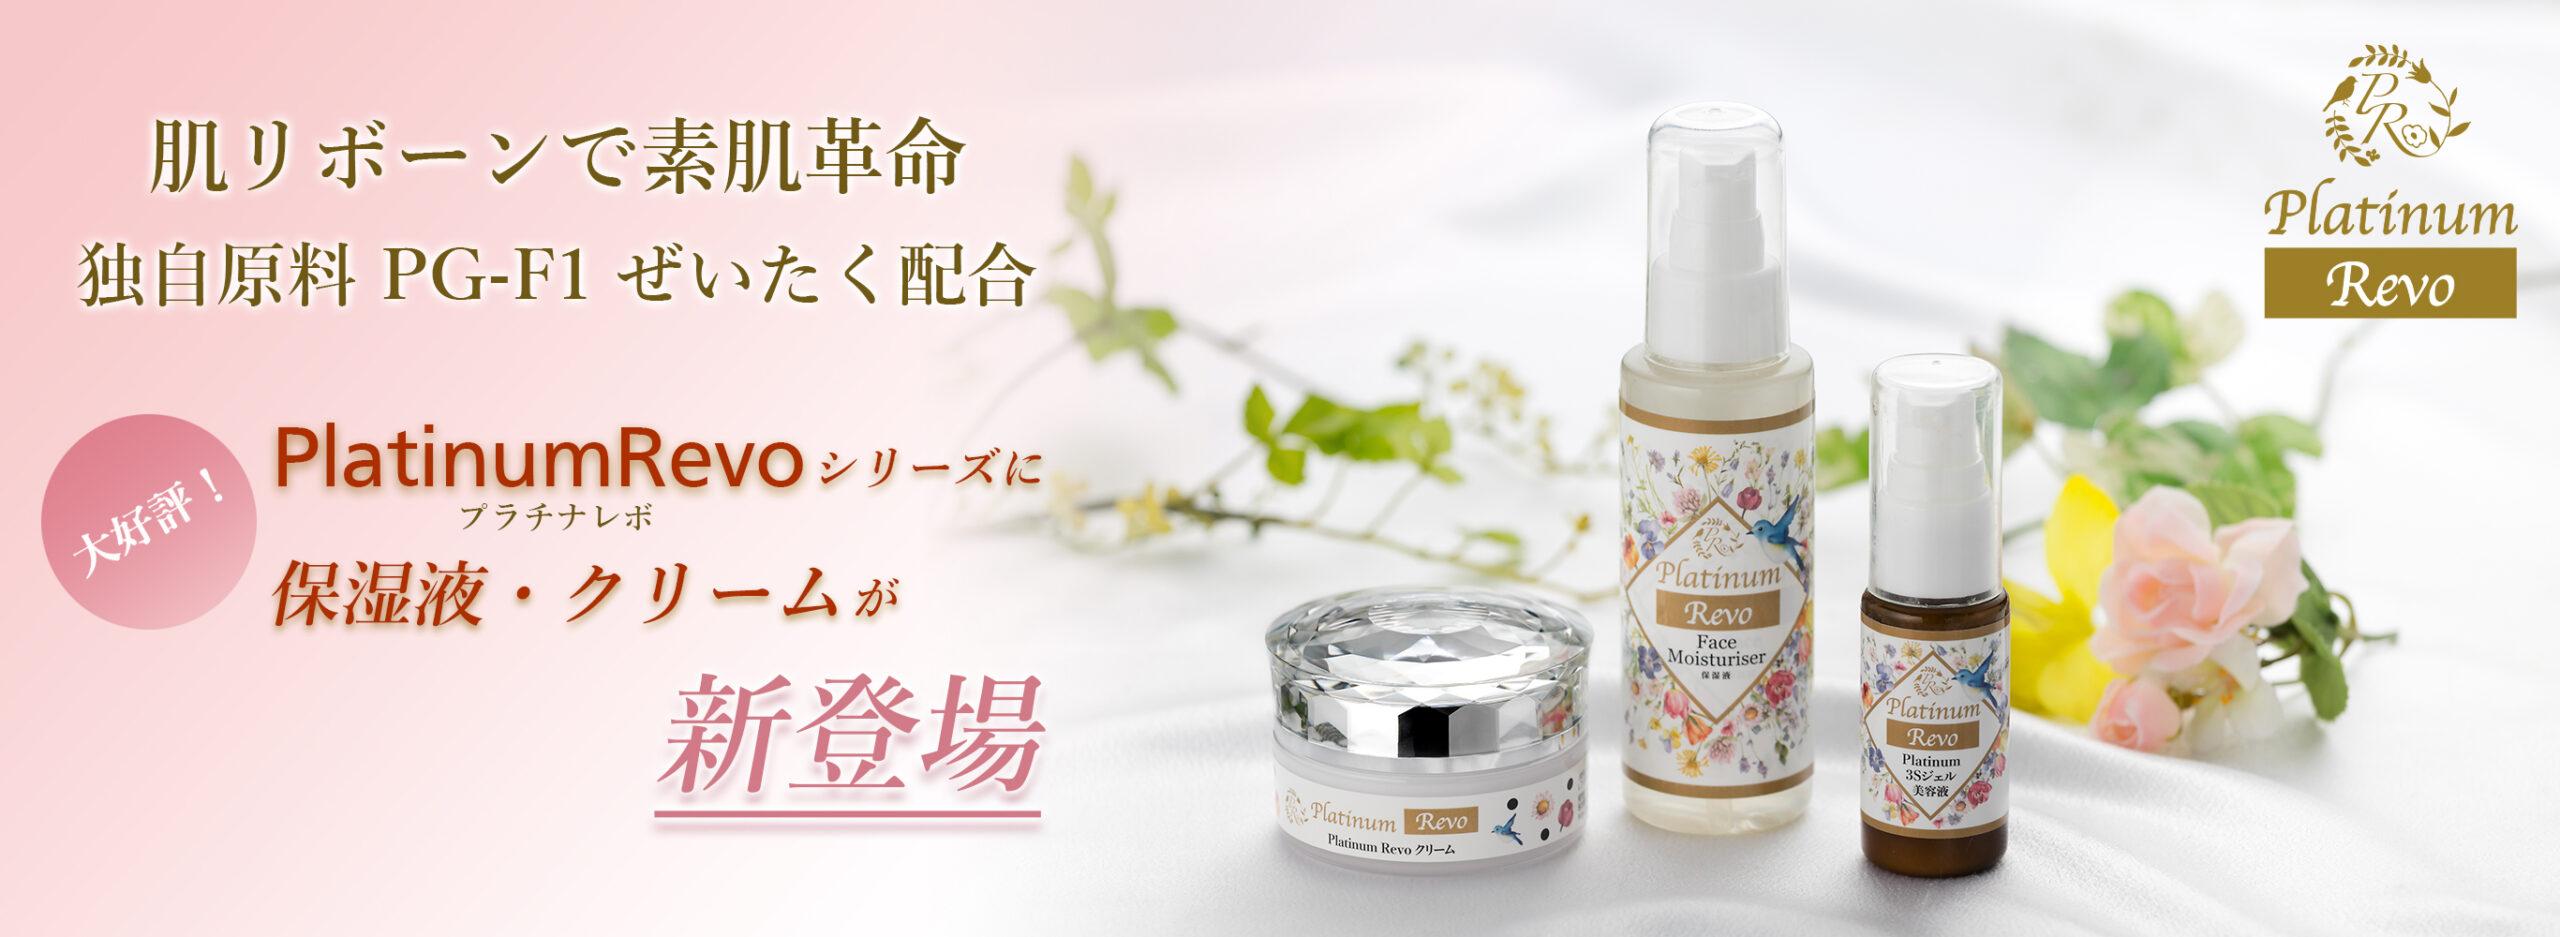 PlatinumRevo(プラチナレボ)保湿液&クリーム新登場